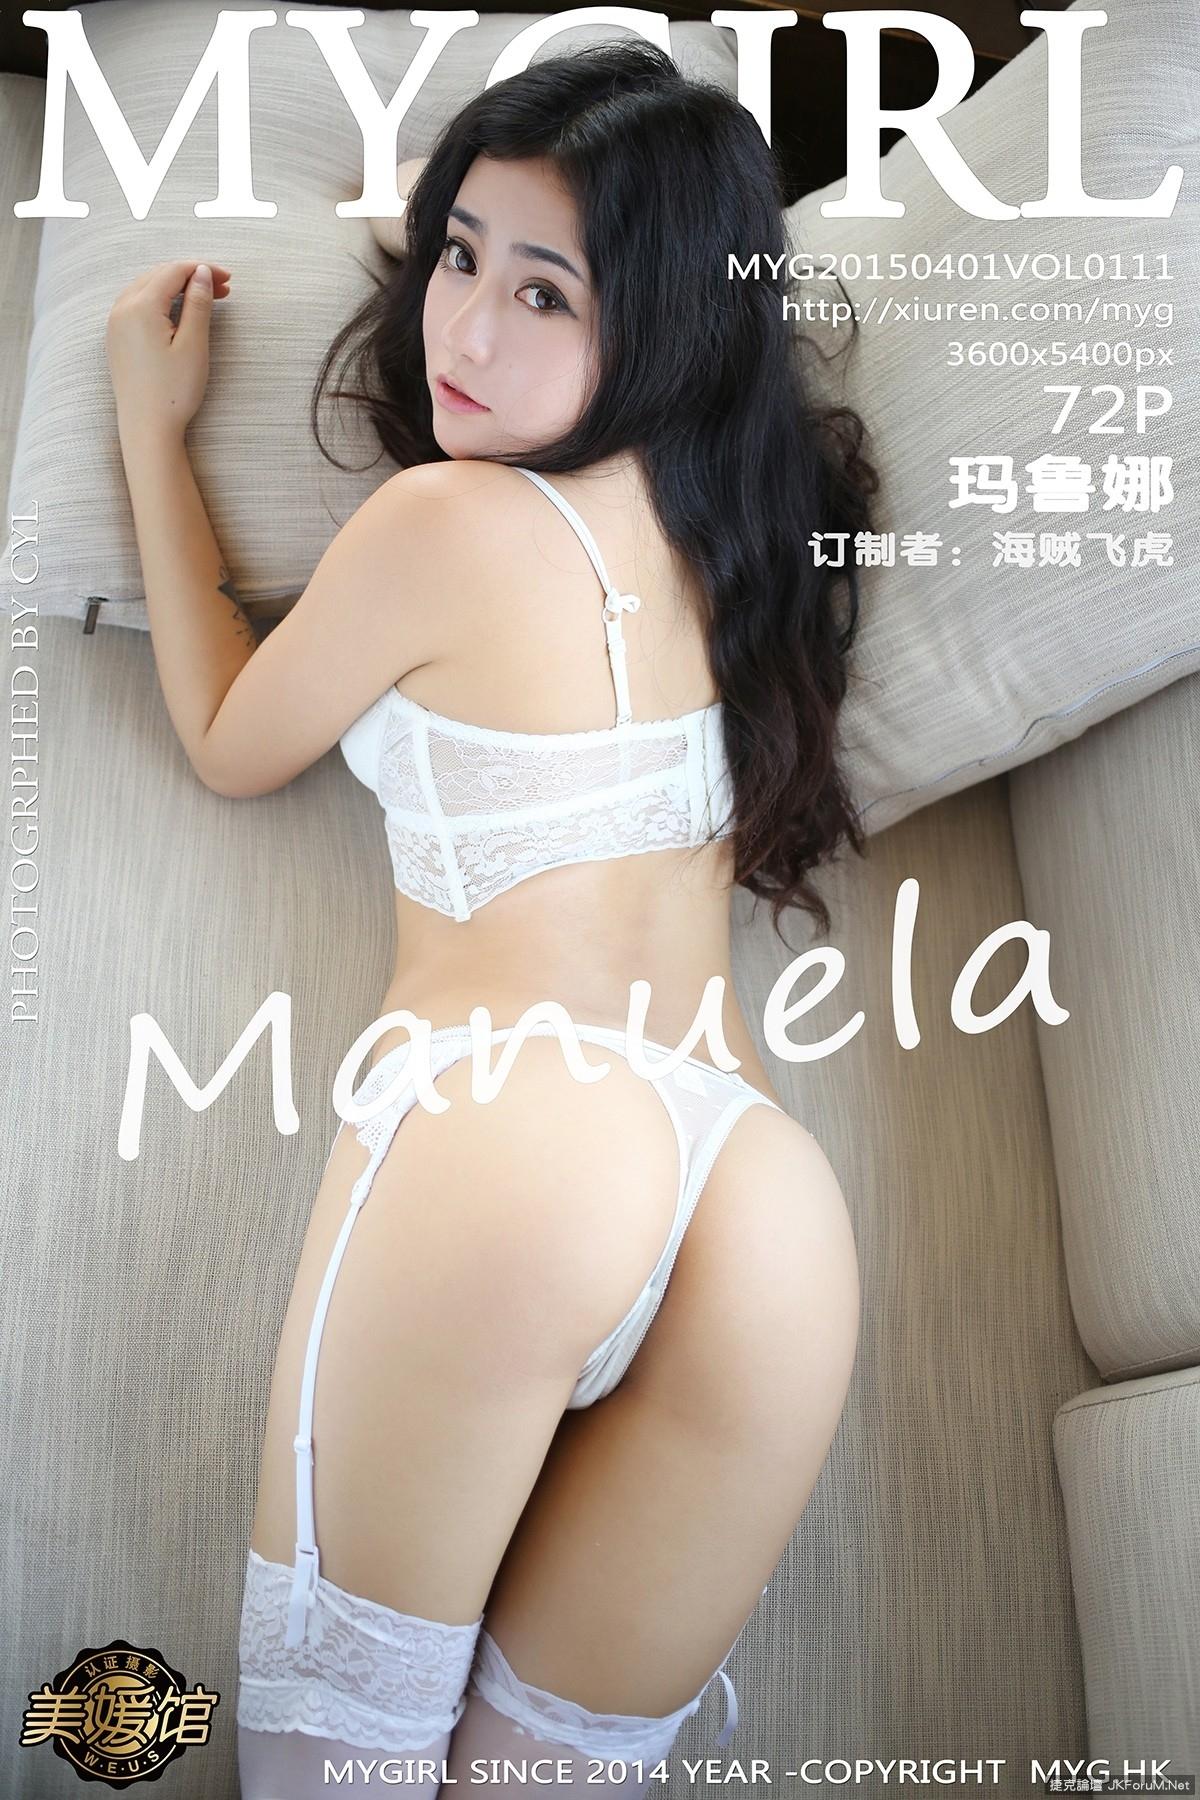 [MyGirl美媛館] Vol.111 Manuela瑪魯娜 大理旅拍(二) [73P] - 貼圖 - 絲襪美腿 -